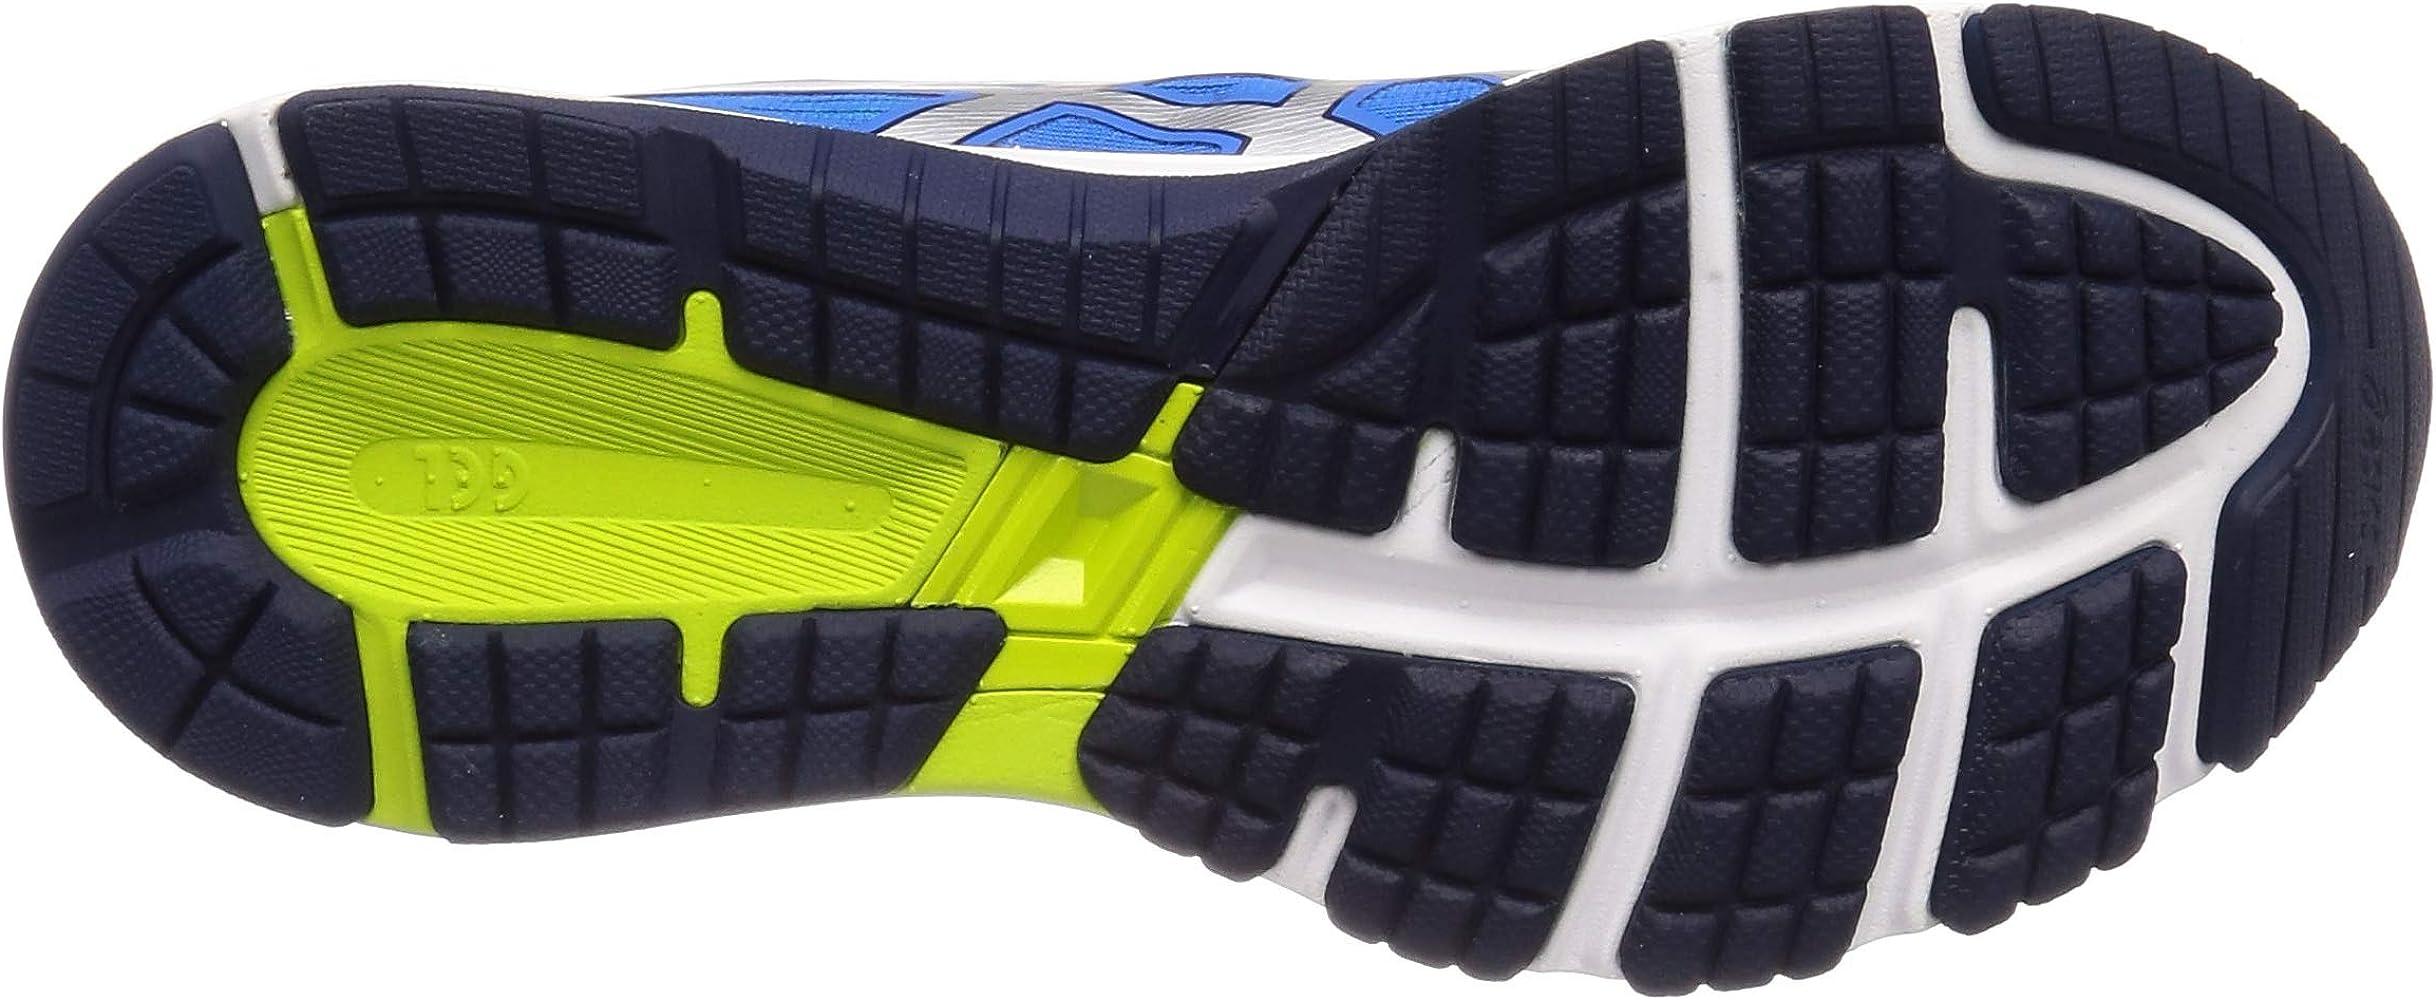 Asics Gt-1000 8, Zapatillas de Running para Hombre, Azul (Electric Blue/Silver 401), 39 EU: Amazon.es: Zapatos y complementos